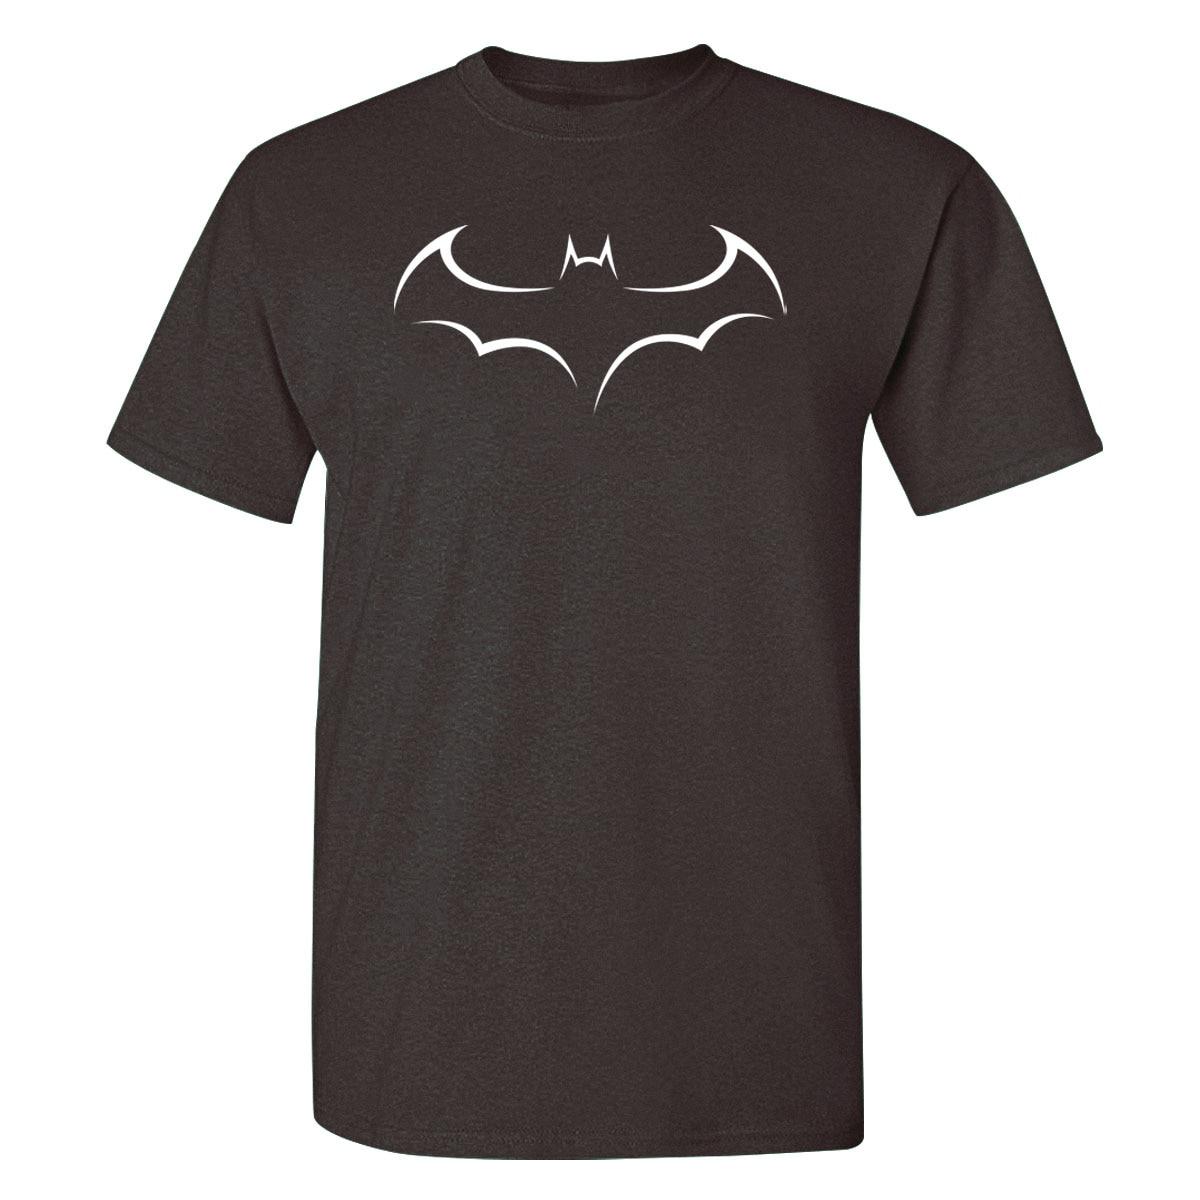 Batman Series Man Hip Hop Summer 100% T-shirt Male Casual Sportswear Homme Harajuku Streetwear Top T-shirts Men's T shirts Cloth